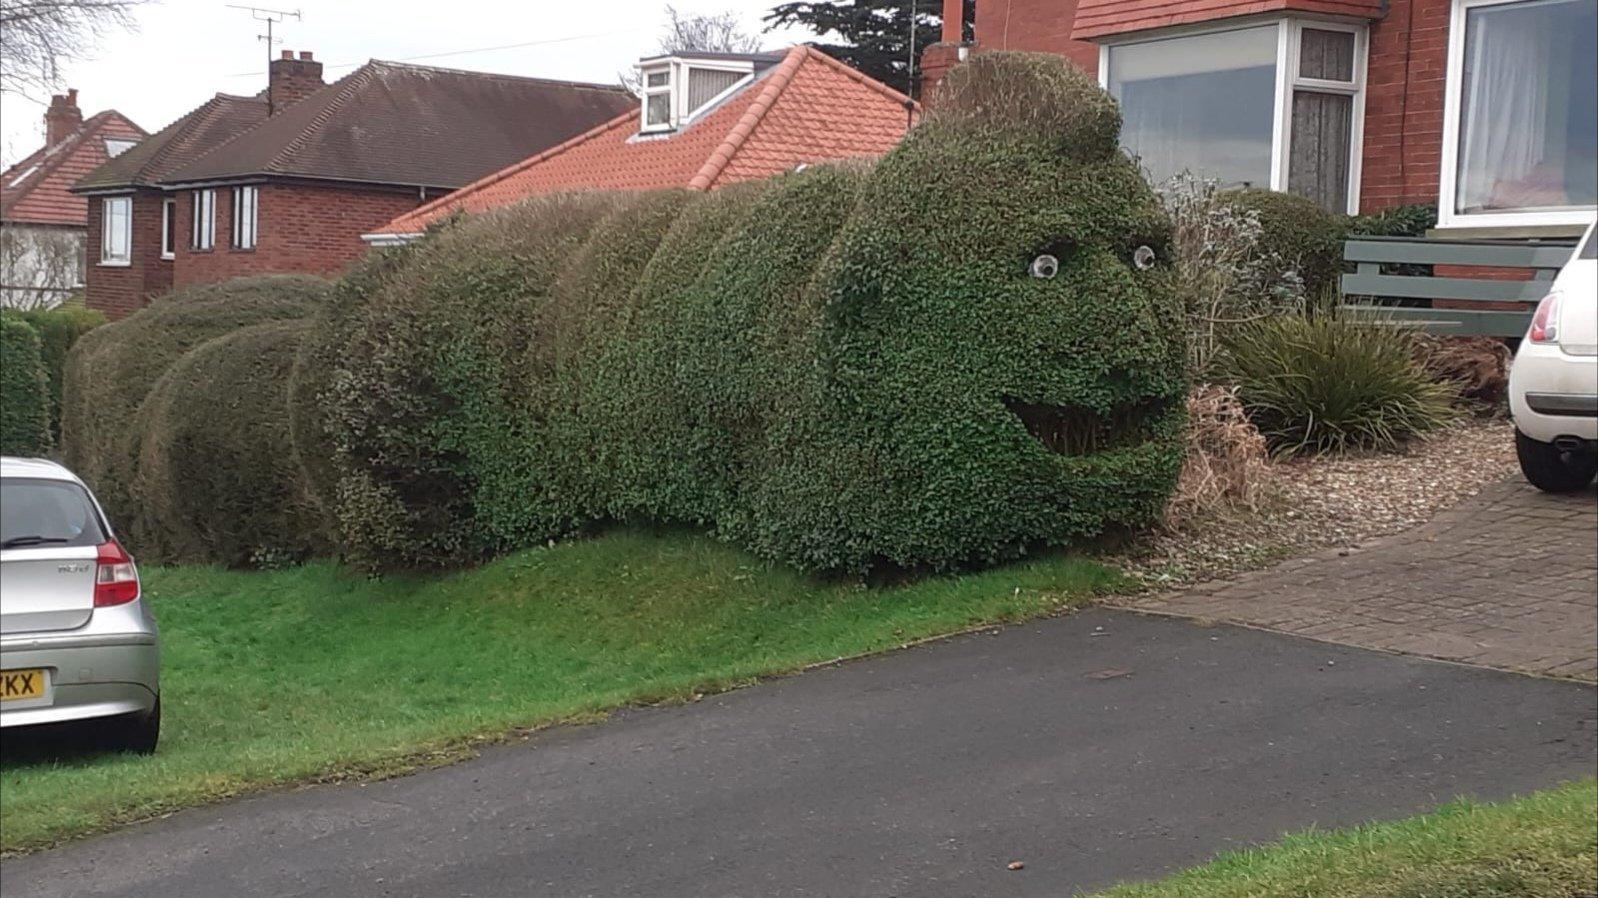 Cursed Hedge - meme